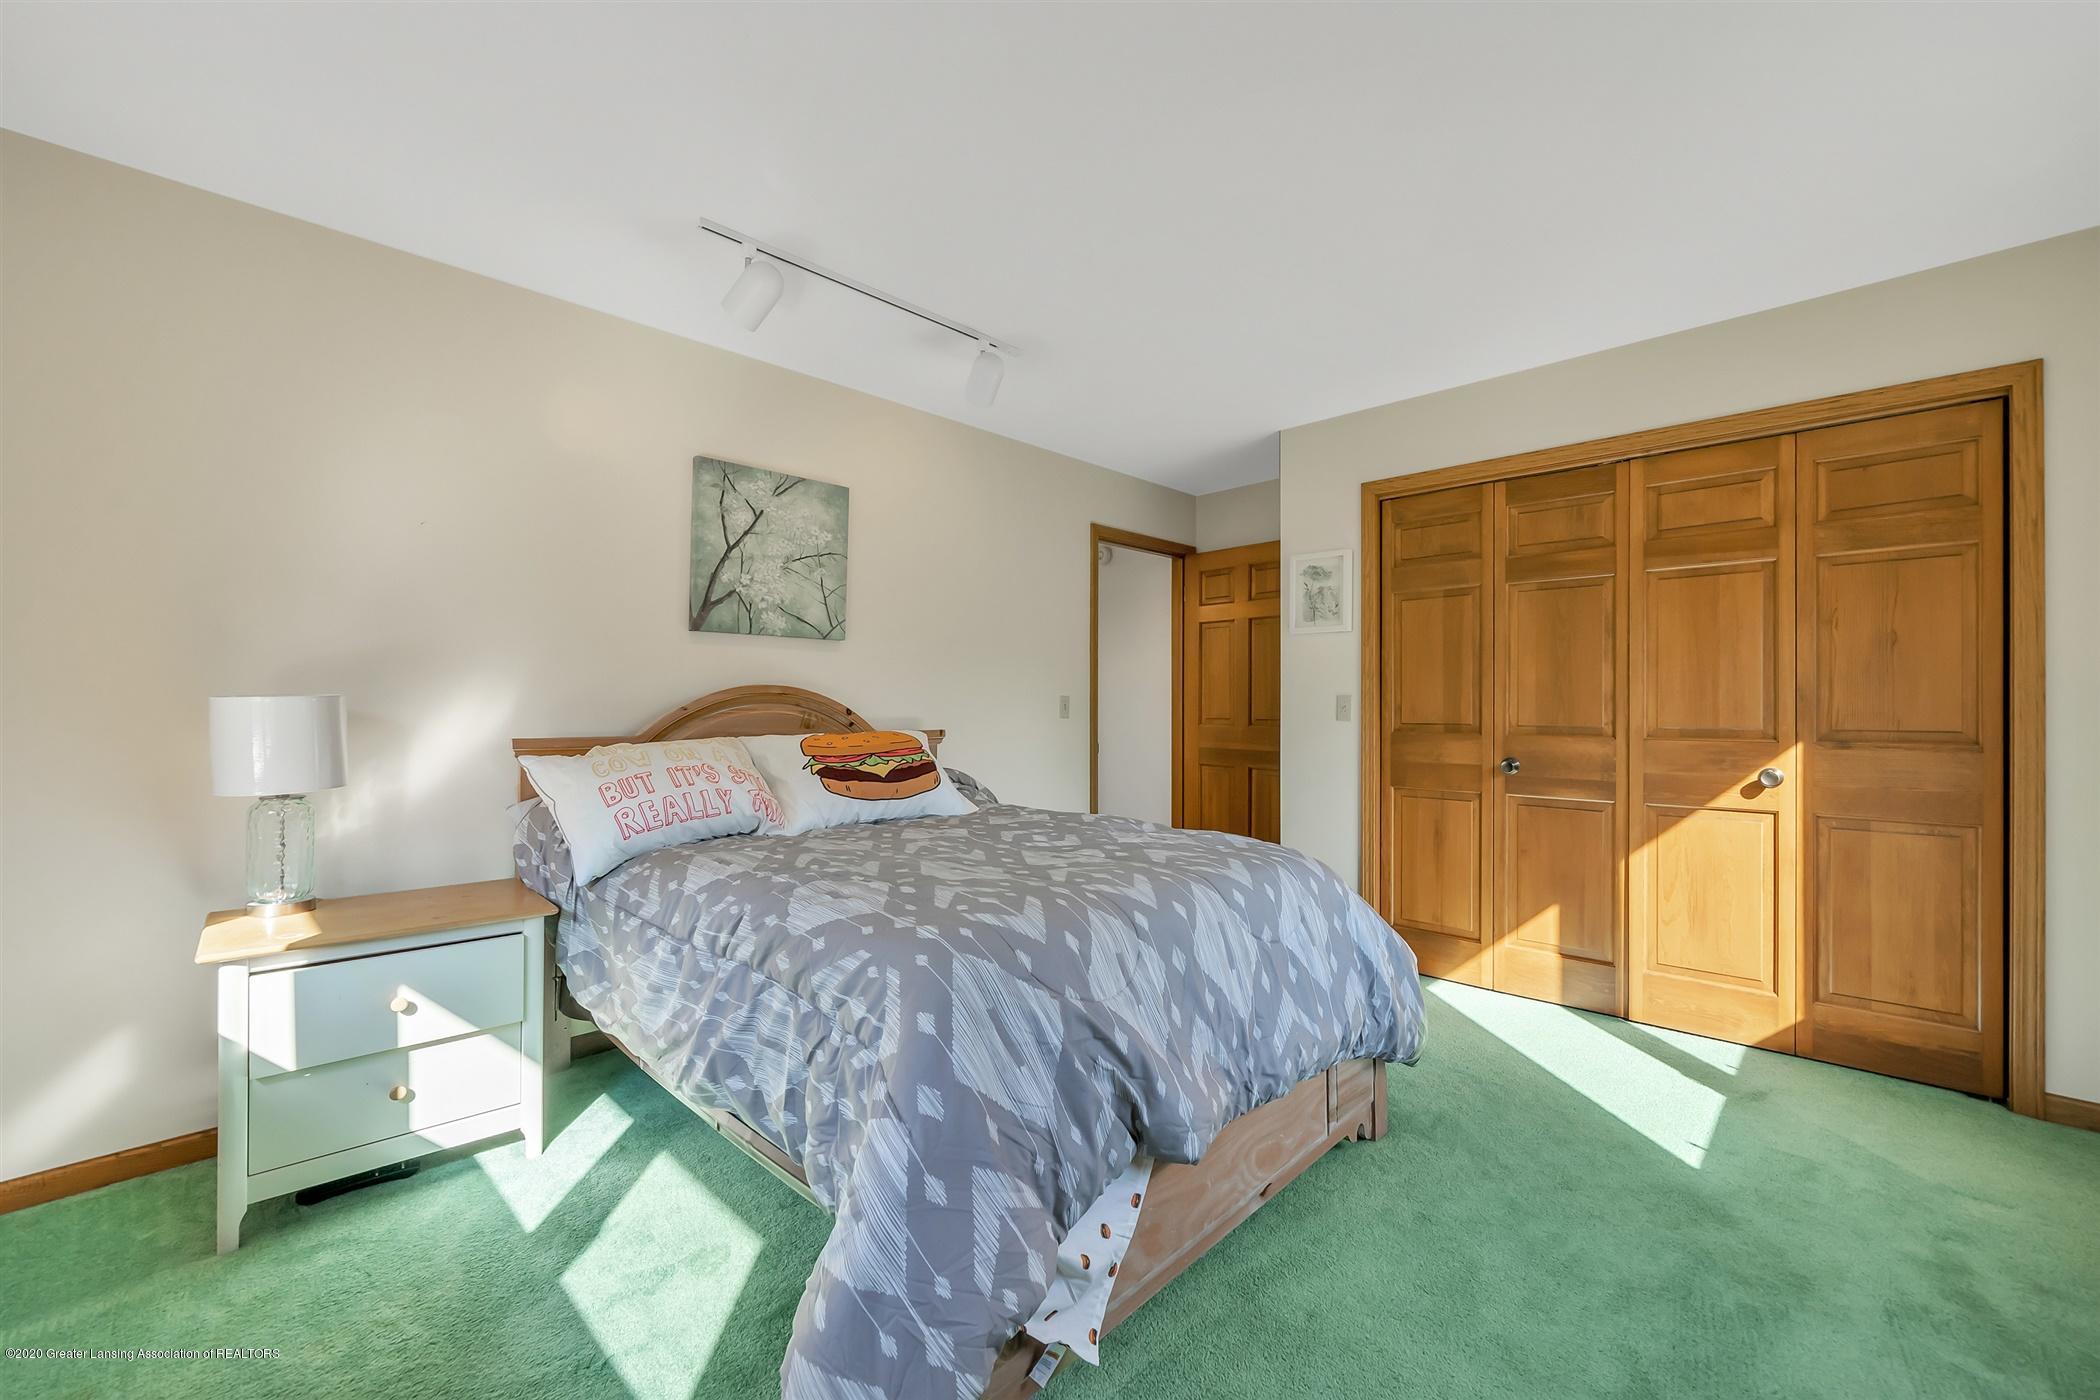 2275 Bravender Rd - SECOND FLOOR Bedroom 4 - 29